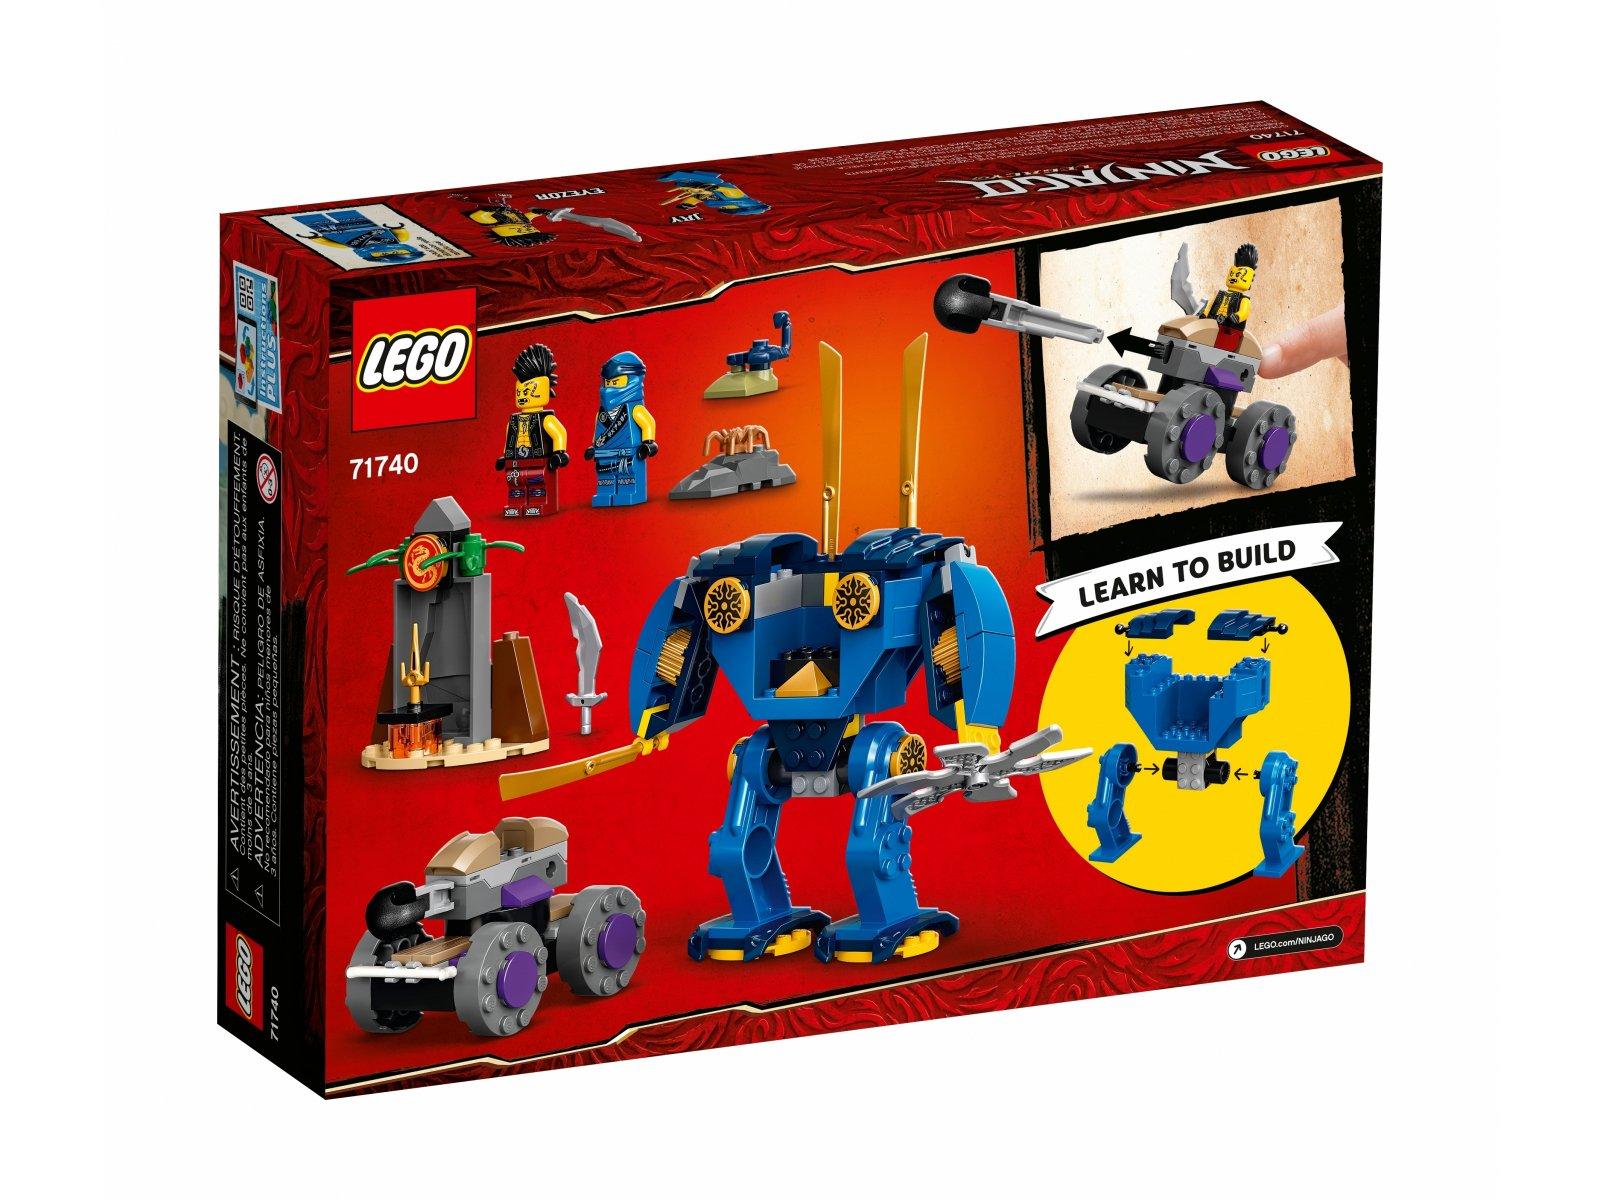 LEGO 71740 Ninjago ElectroMech